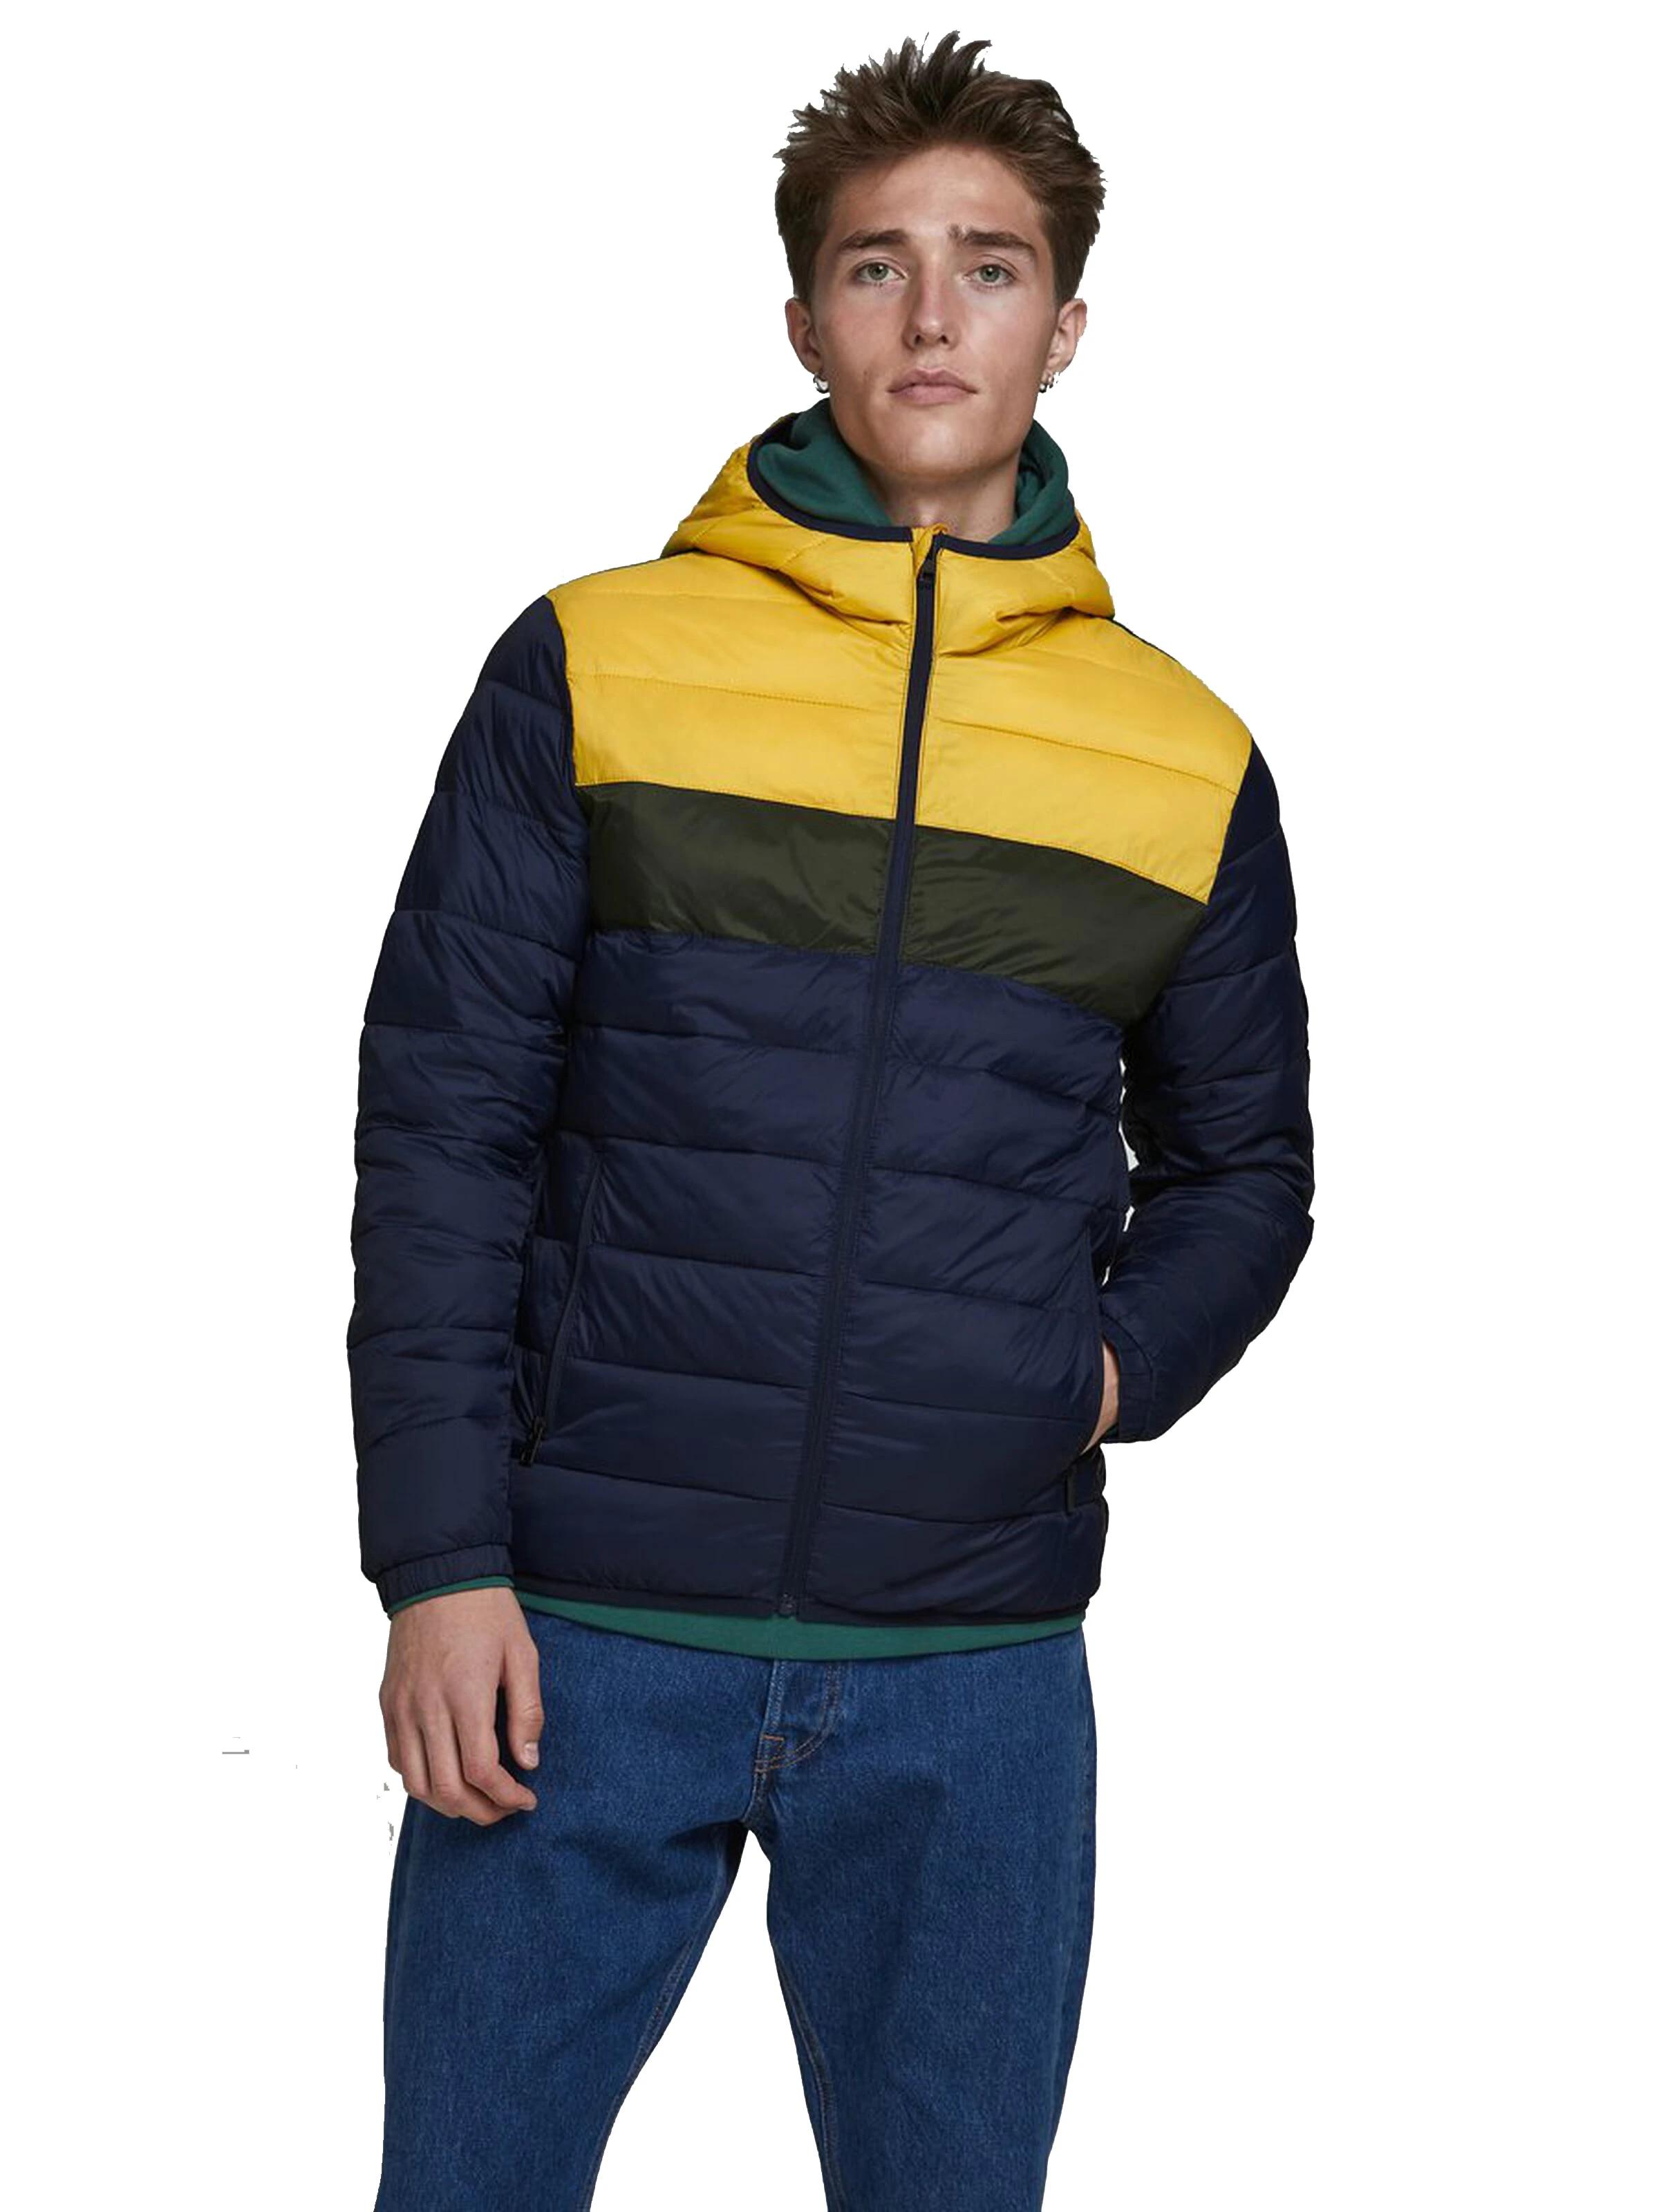 Jack Jones Hombre Jacket Cazadora Acolchada Con Capucha Jjemagic Puffer Tricolor Amarillo Azul Moda Casual Chaquetas Aliexpress